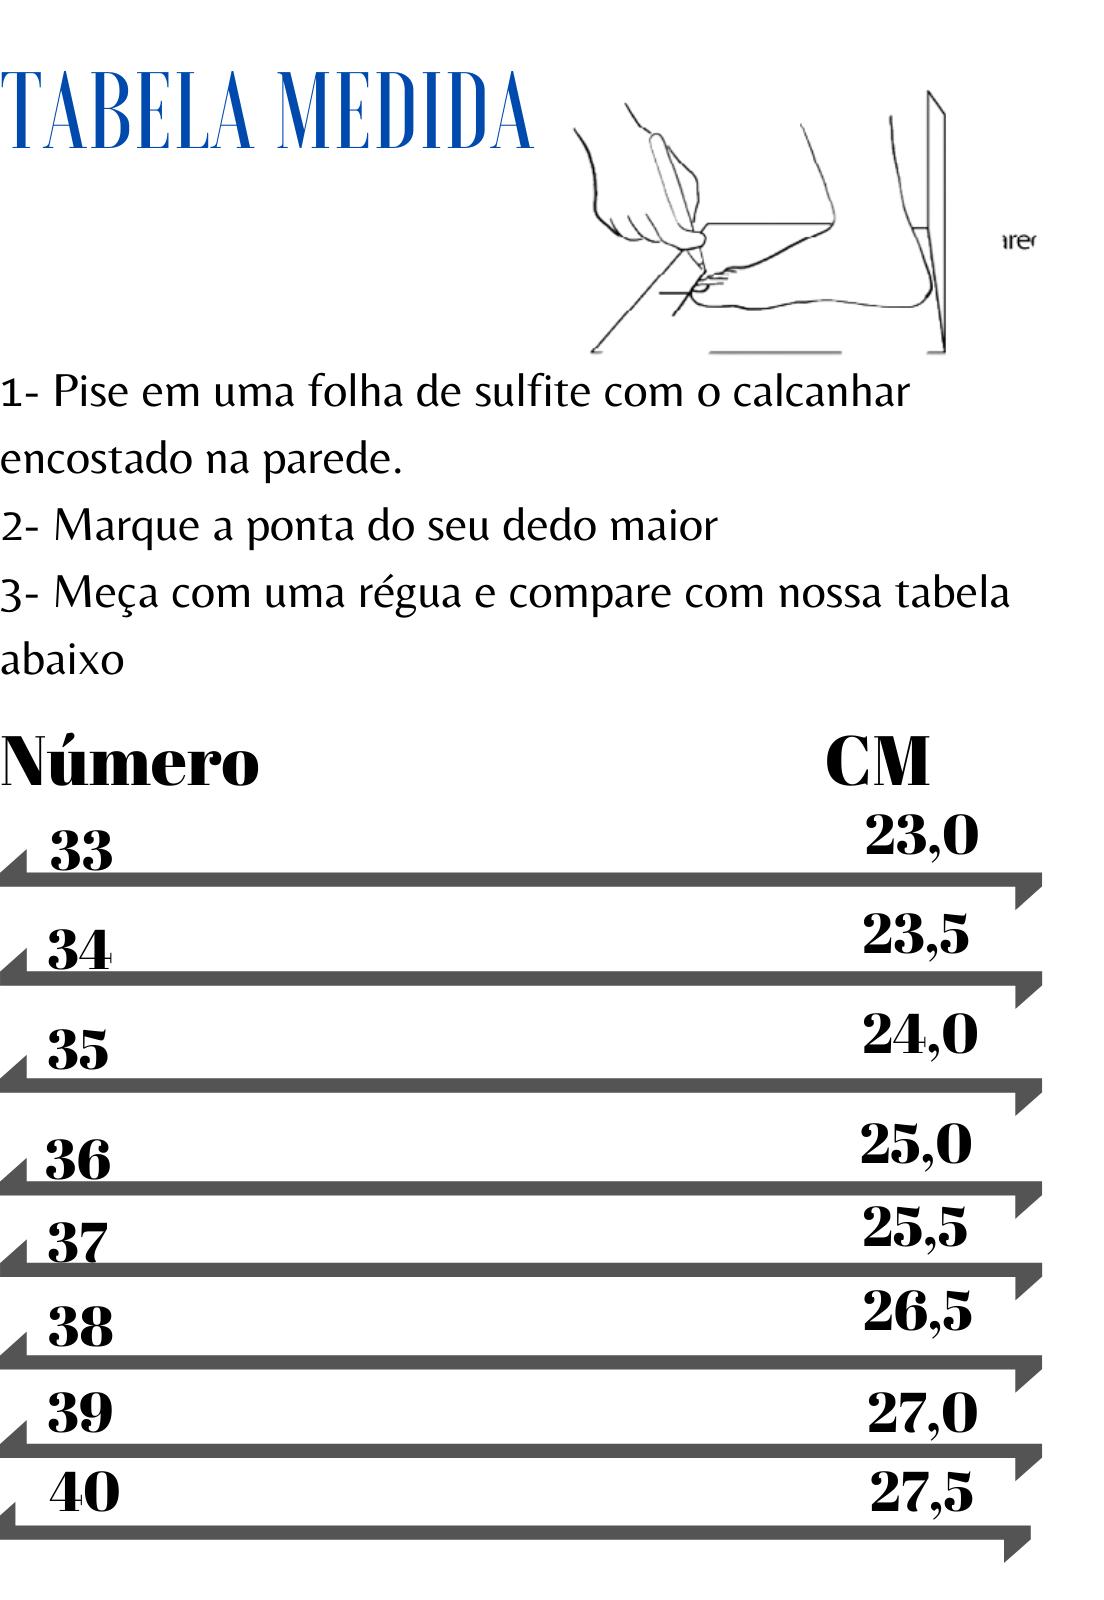 Botinha Gommix 26100 verniz Preto Jaguatirica